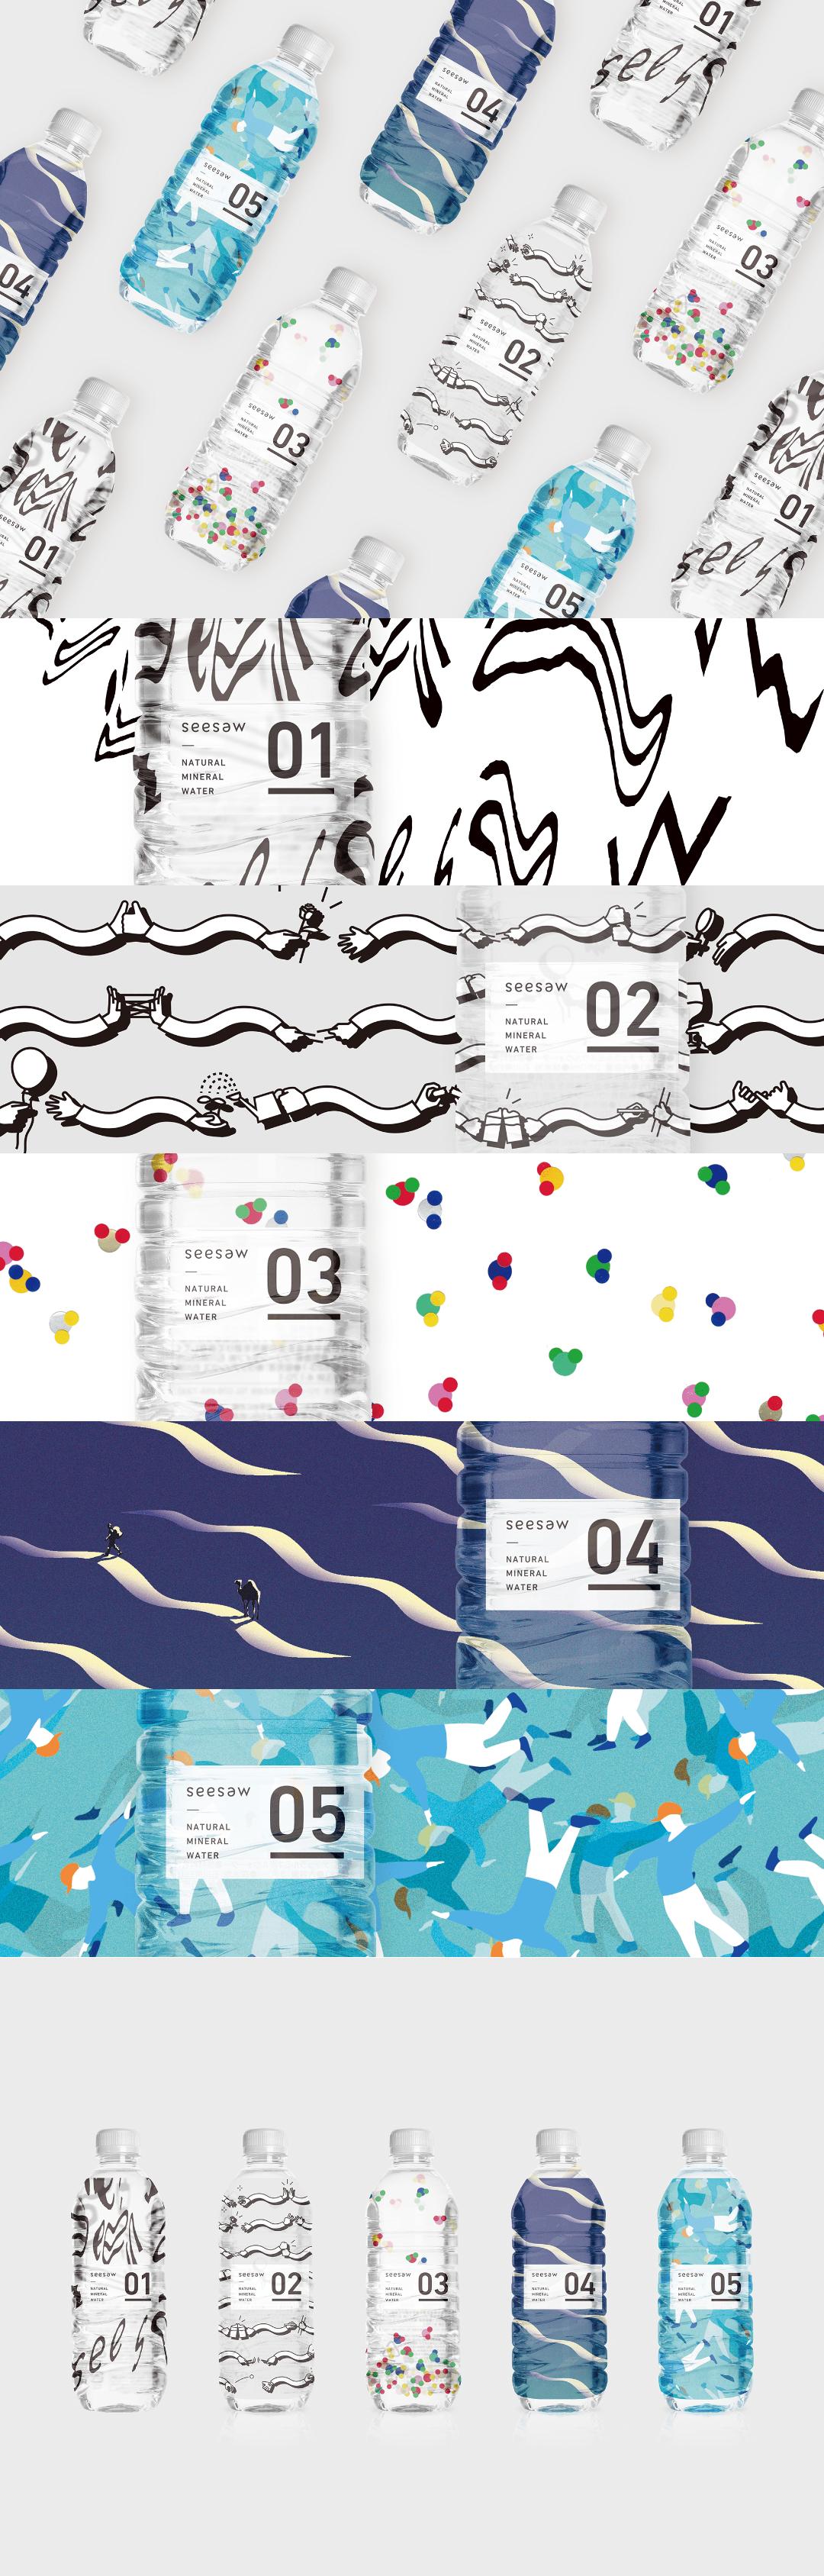 Illustration,Graphic Design,Packaging